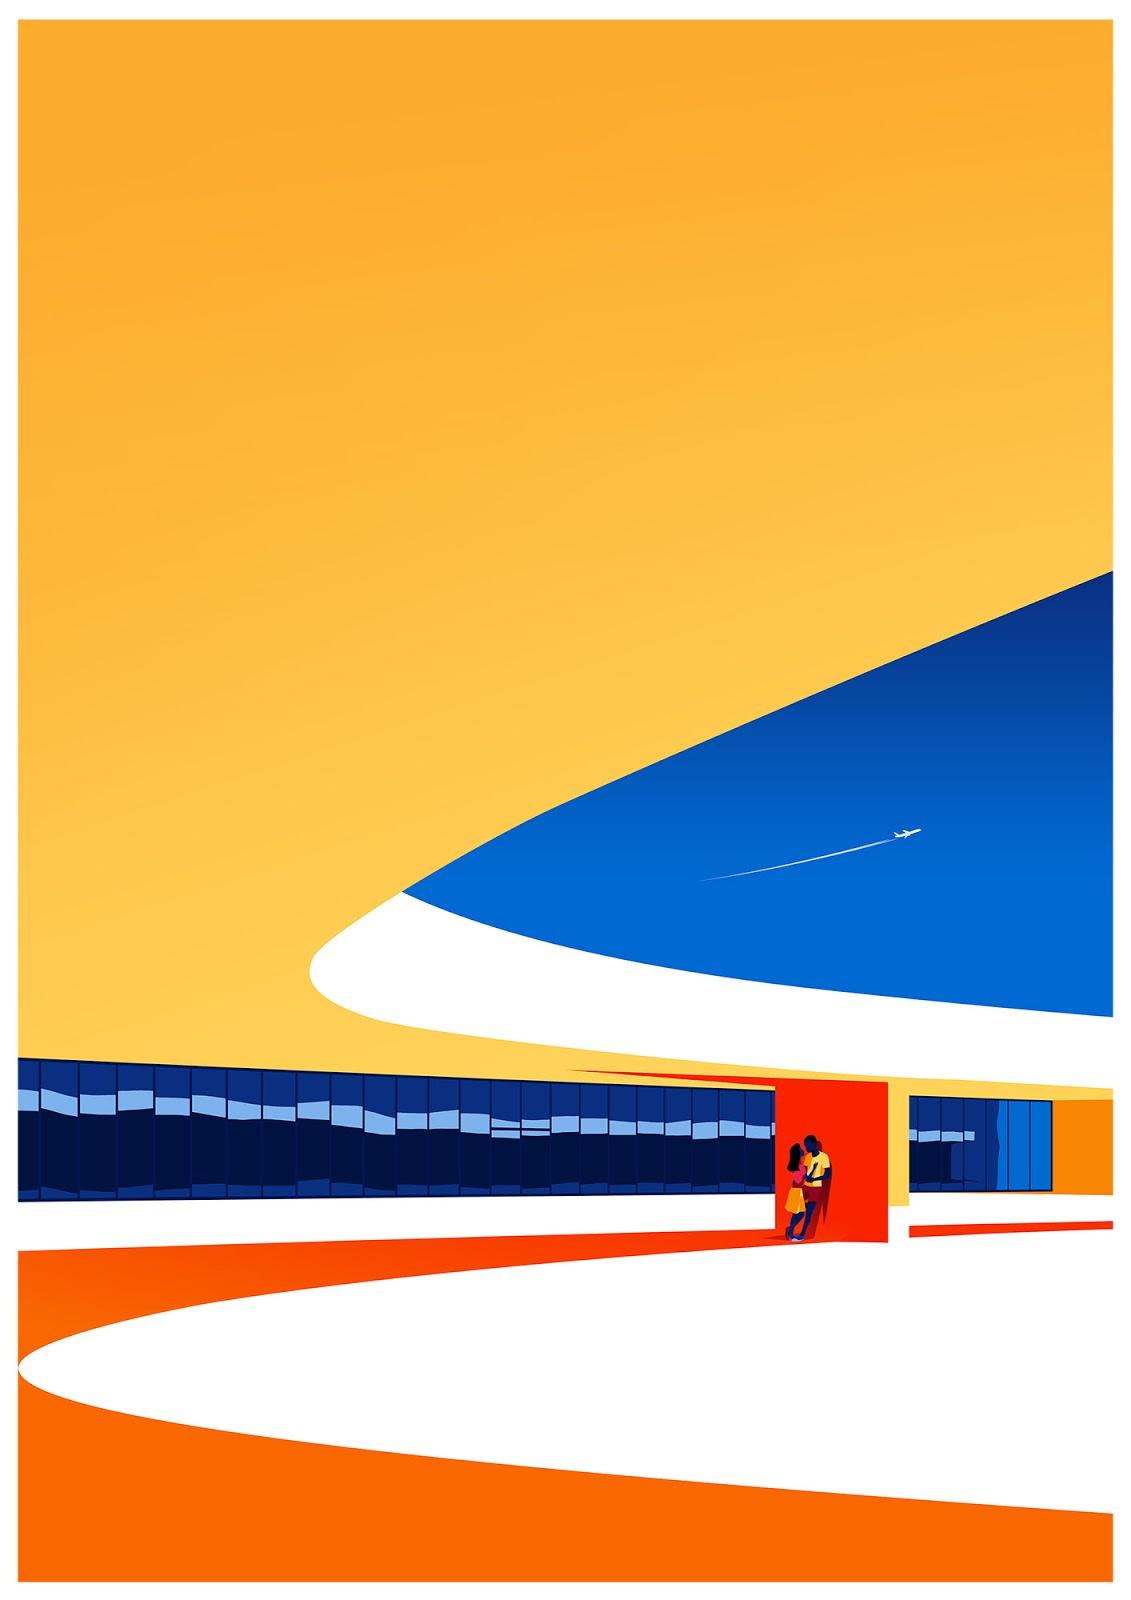 Levente Szabo纪念建筑师Oscar Niemeyer的插画作品